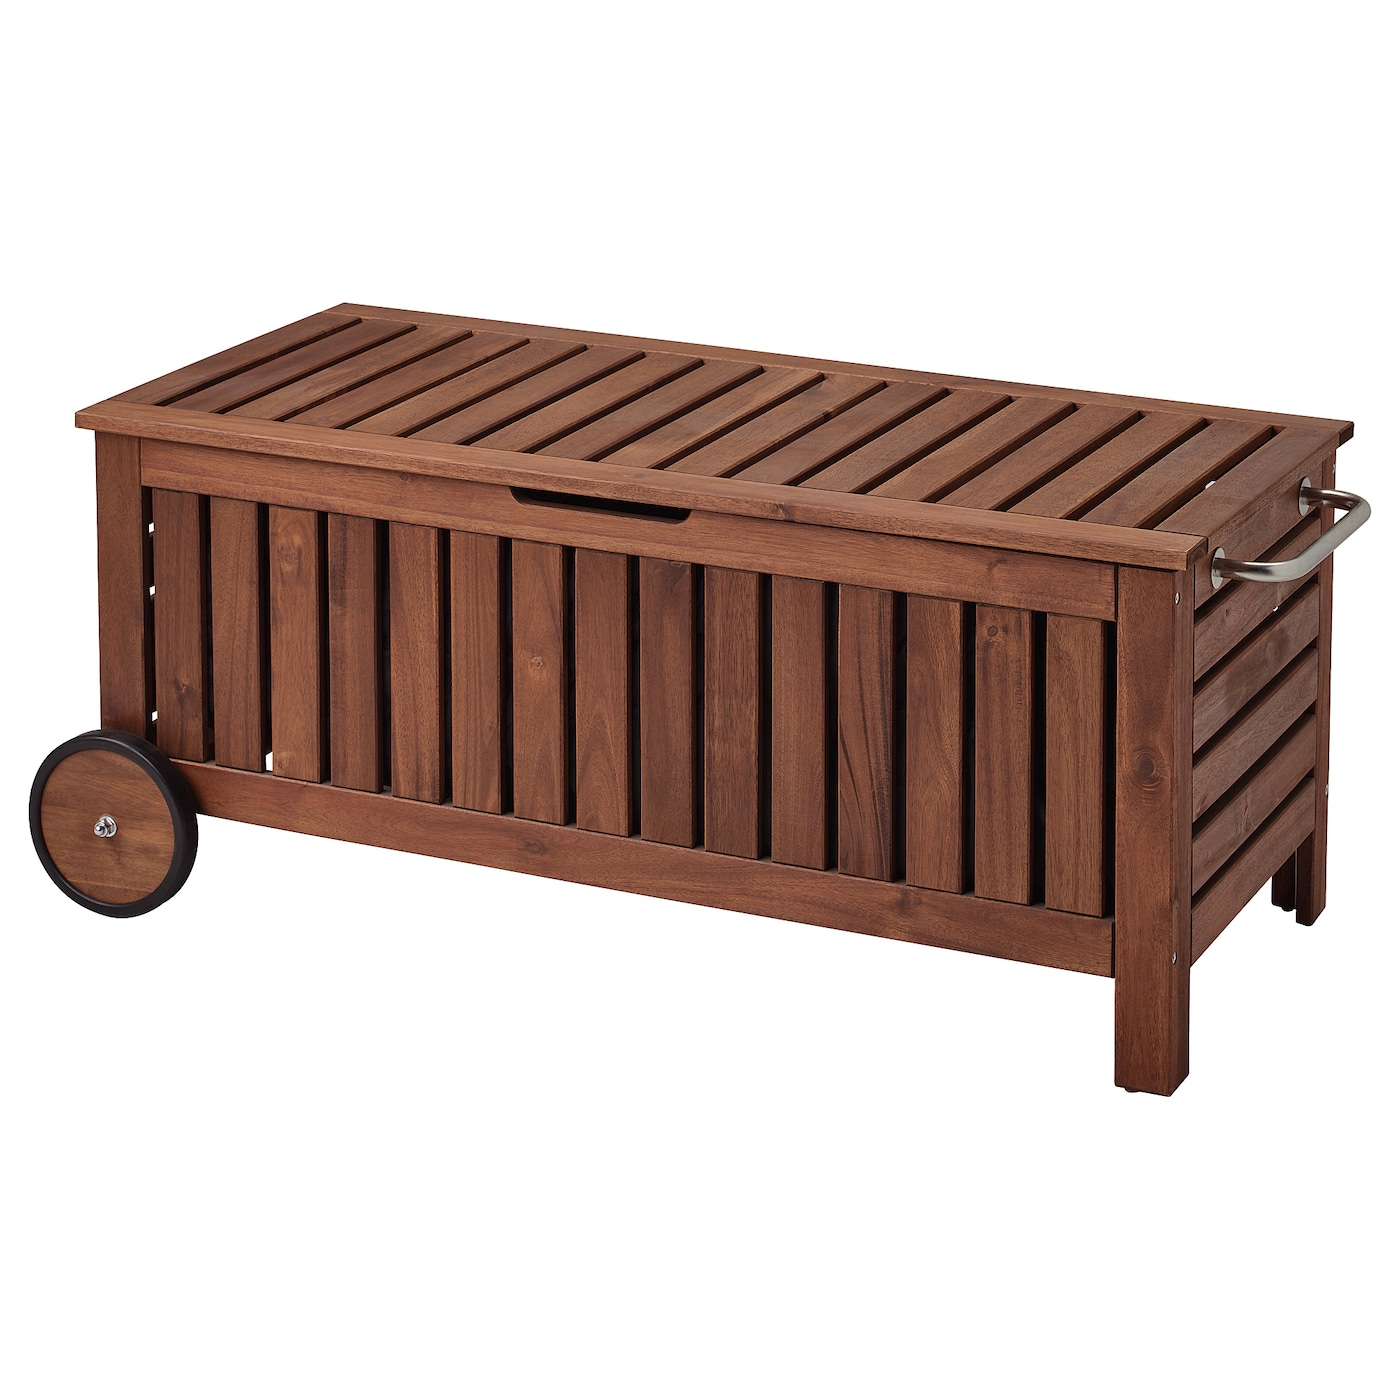 ÄPPLARÖ Storage bench, outdoor - brown stained brown - IKEA